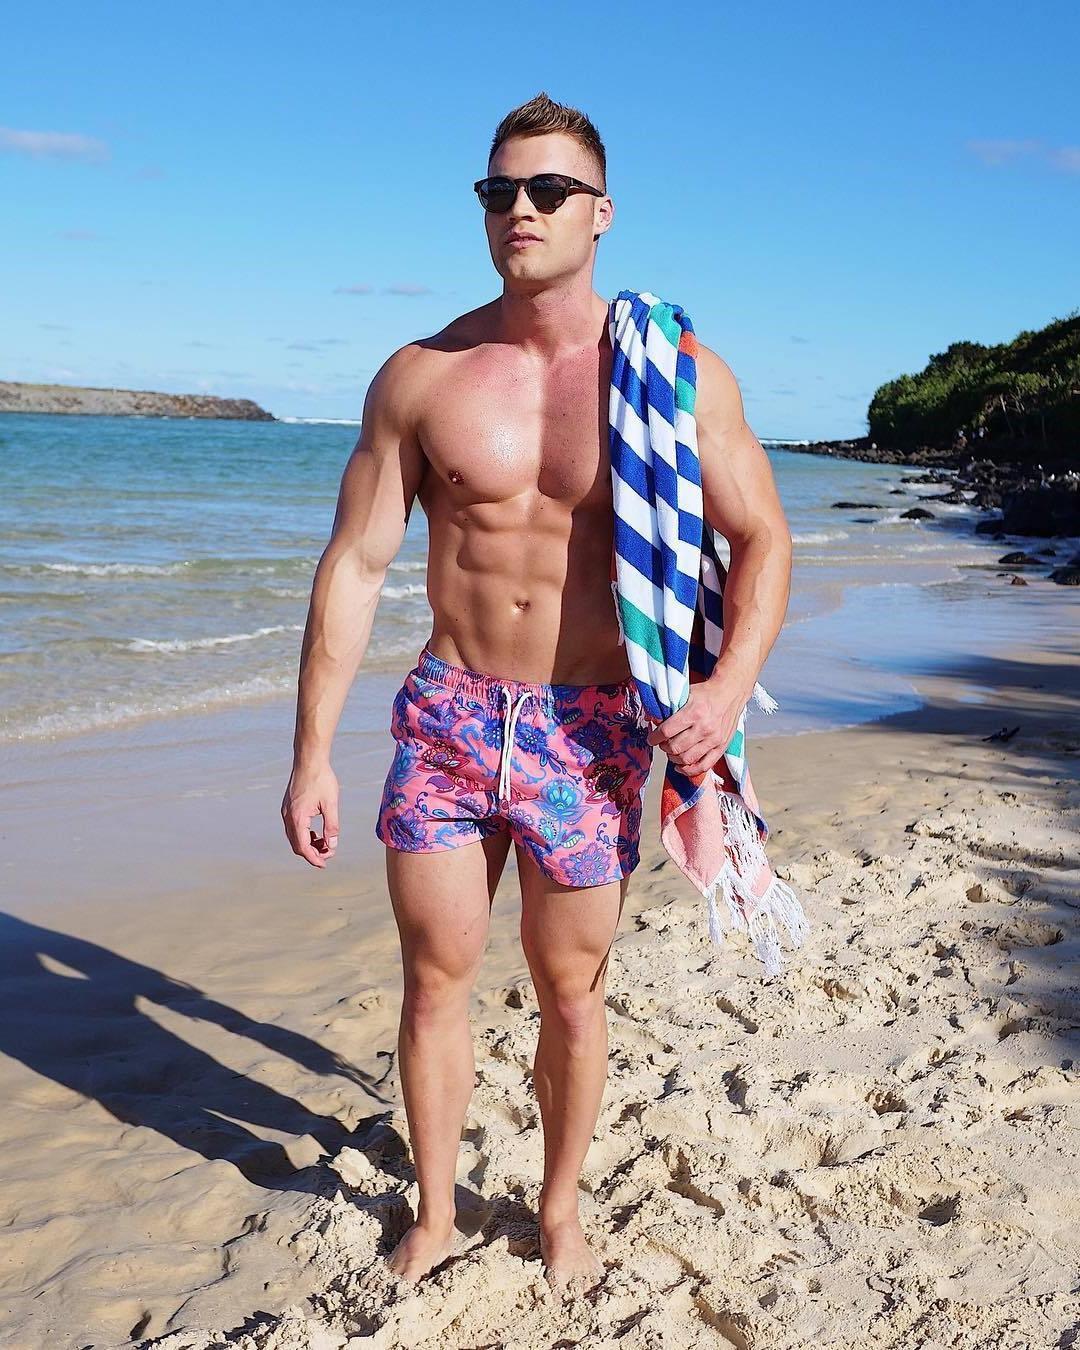 sexy-arrogant-men-muscle-jay-darko-shirtless-fit-beach-hunk